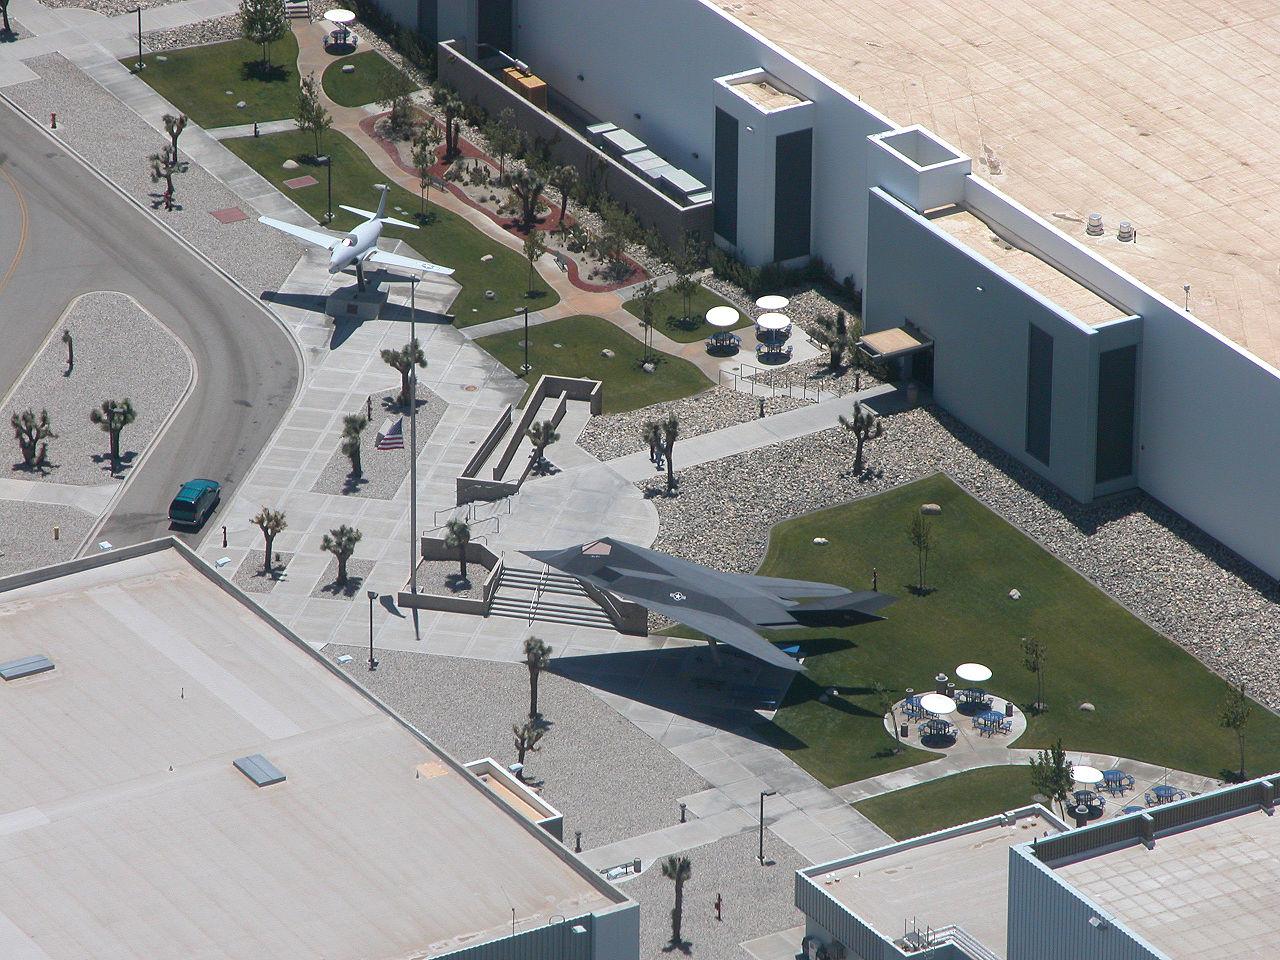 Территория производства Skunk works вПалмдейле, Калифорния.